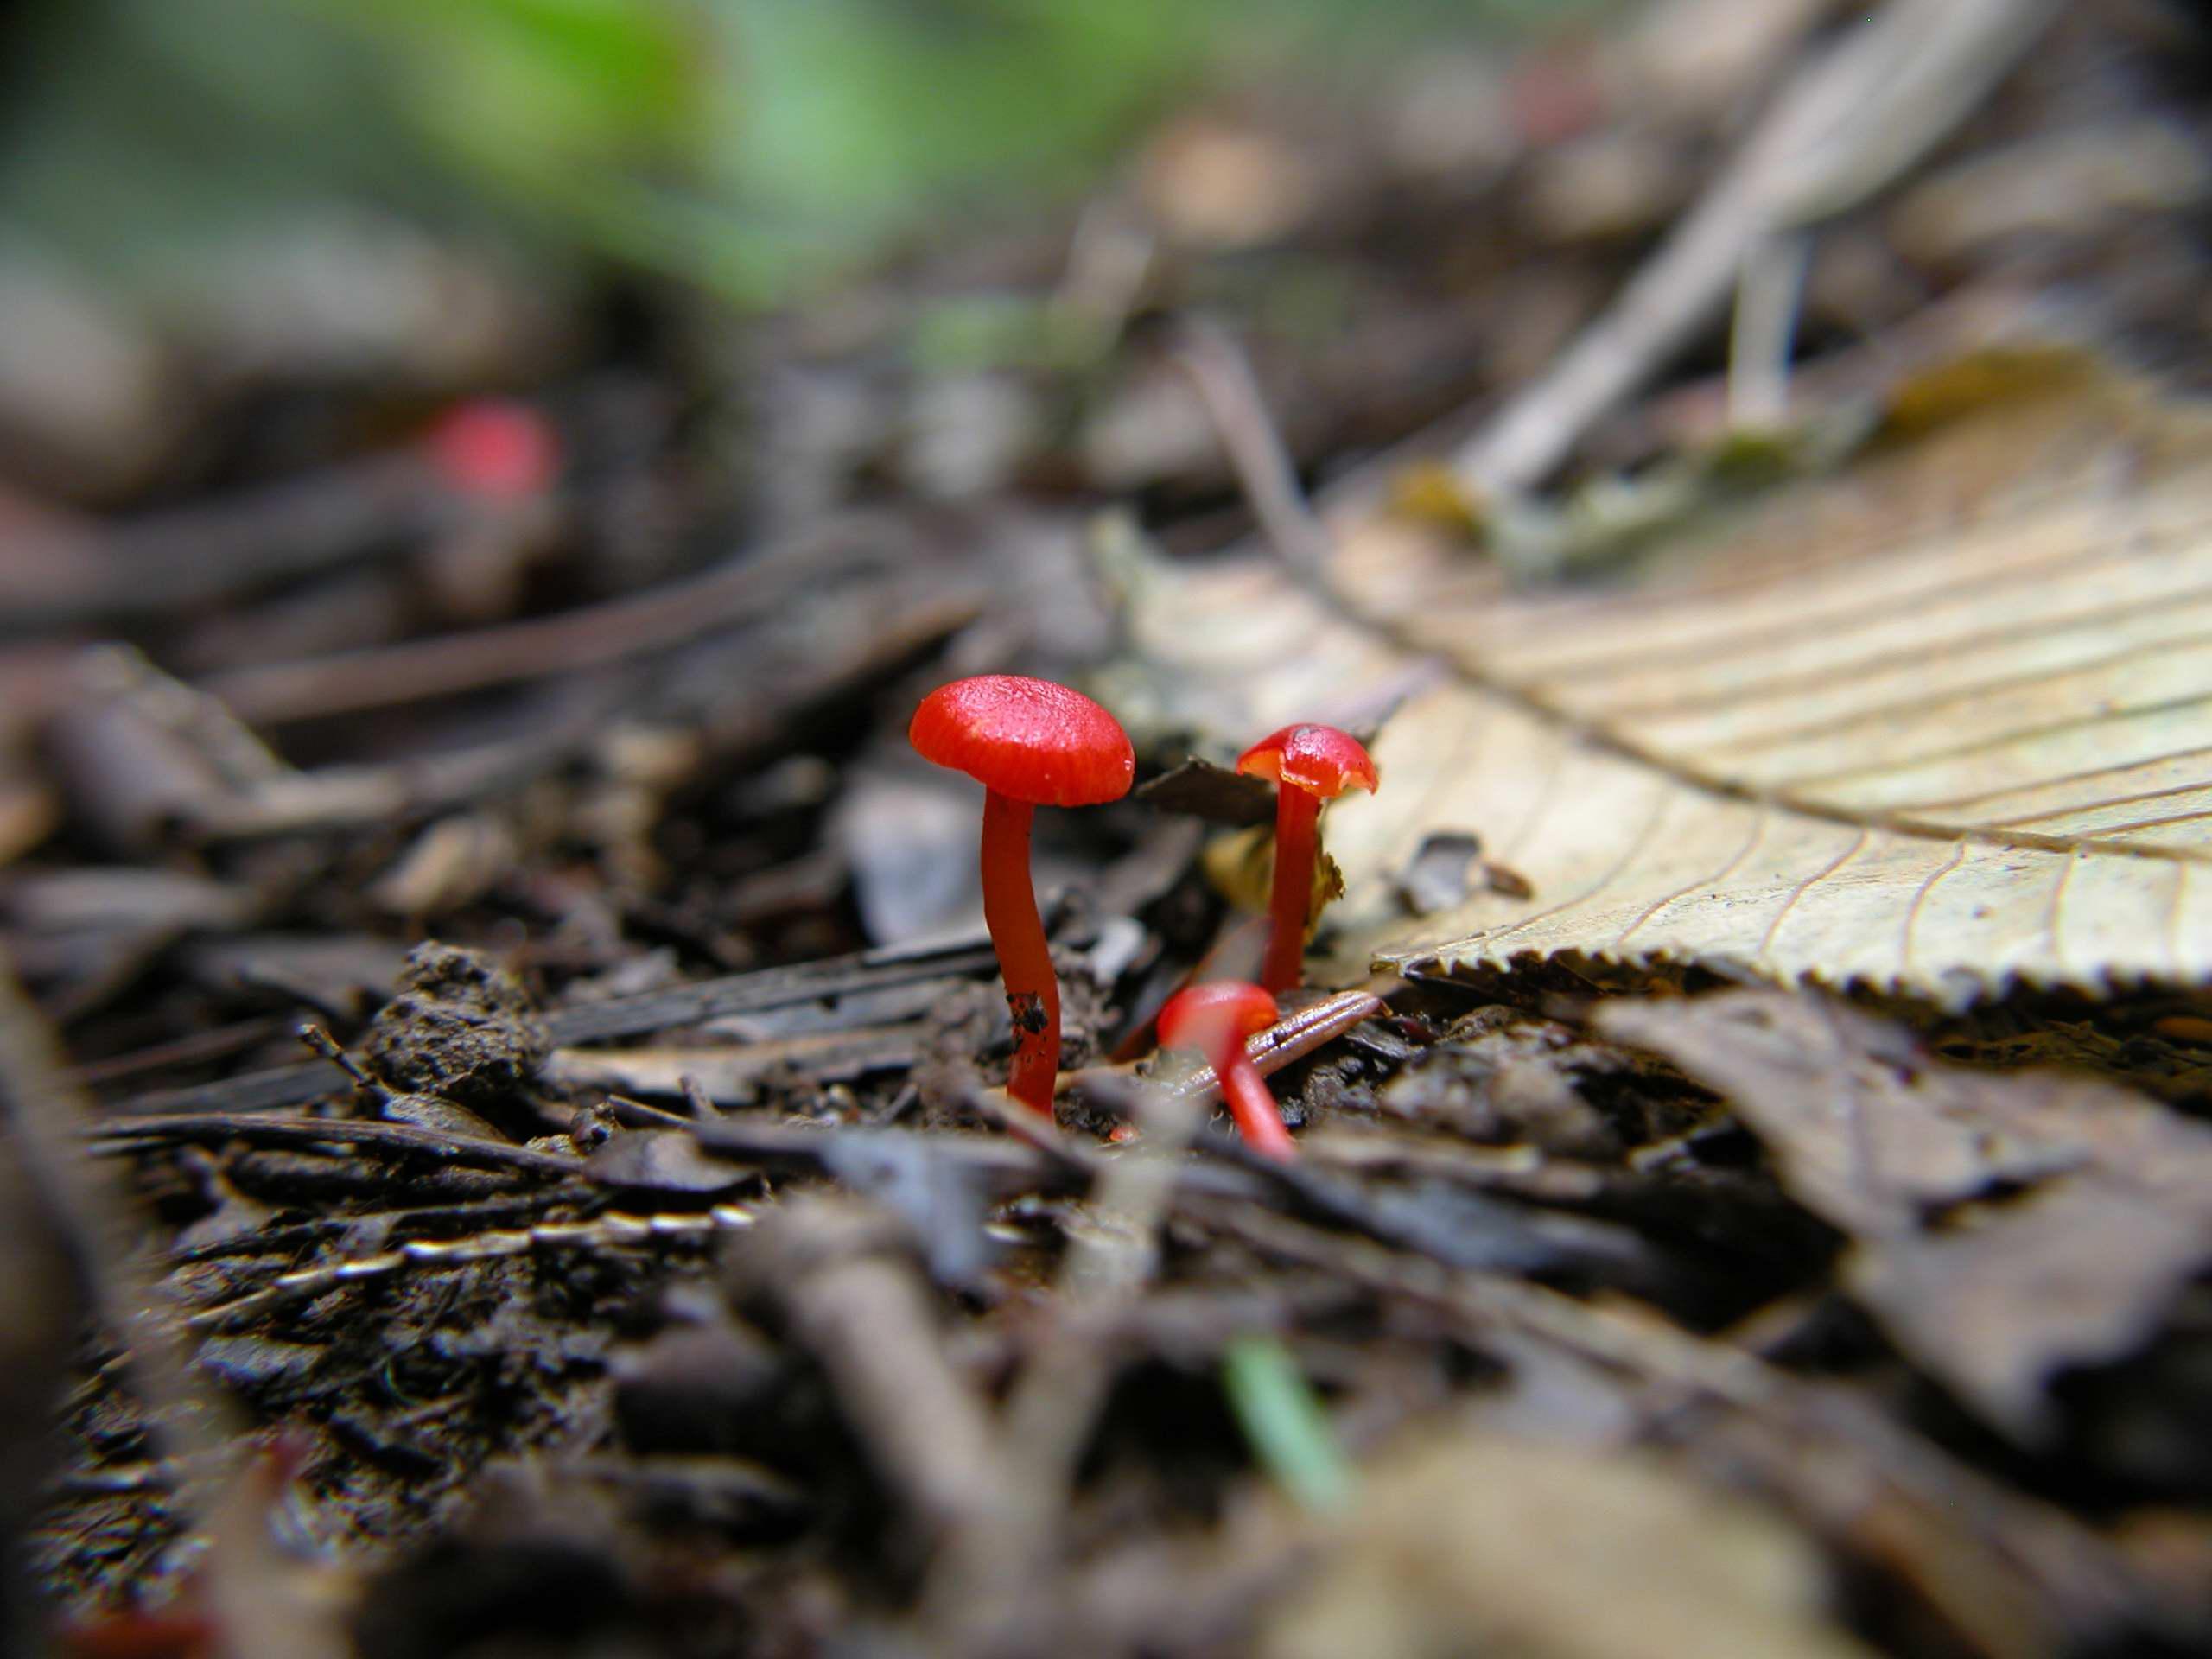 Little red mushroom photo